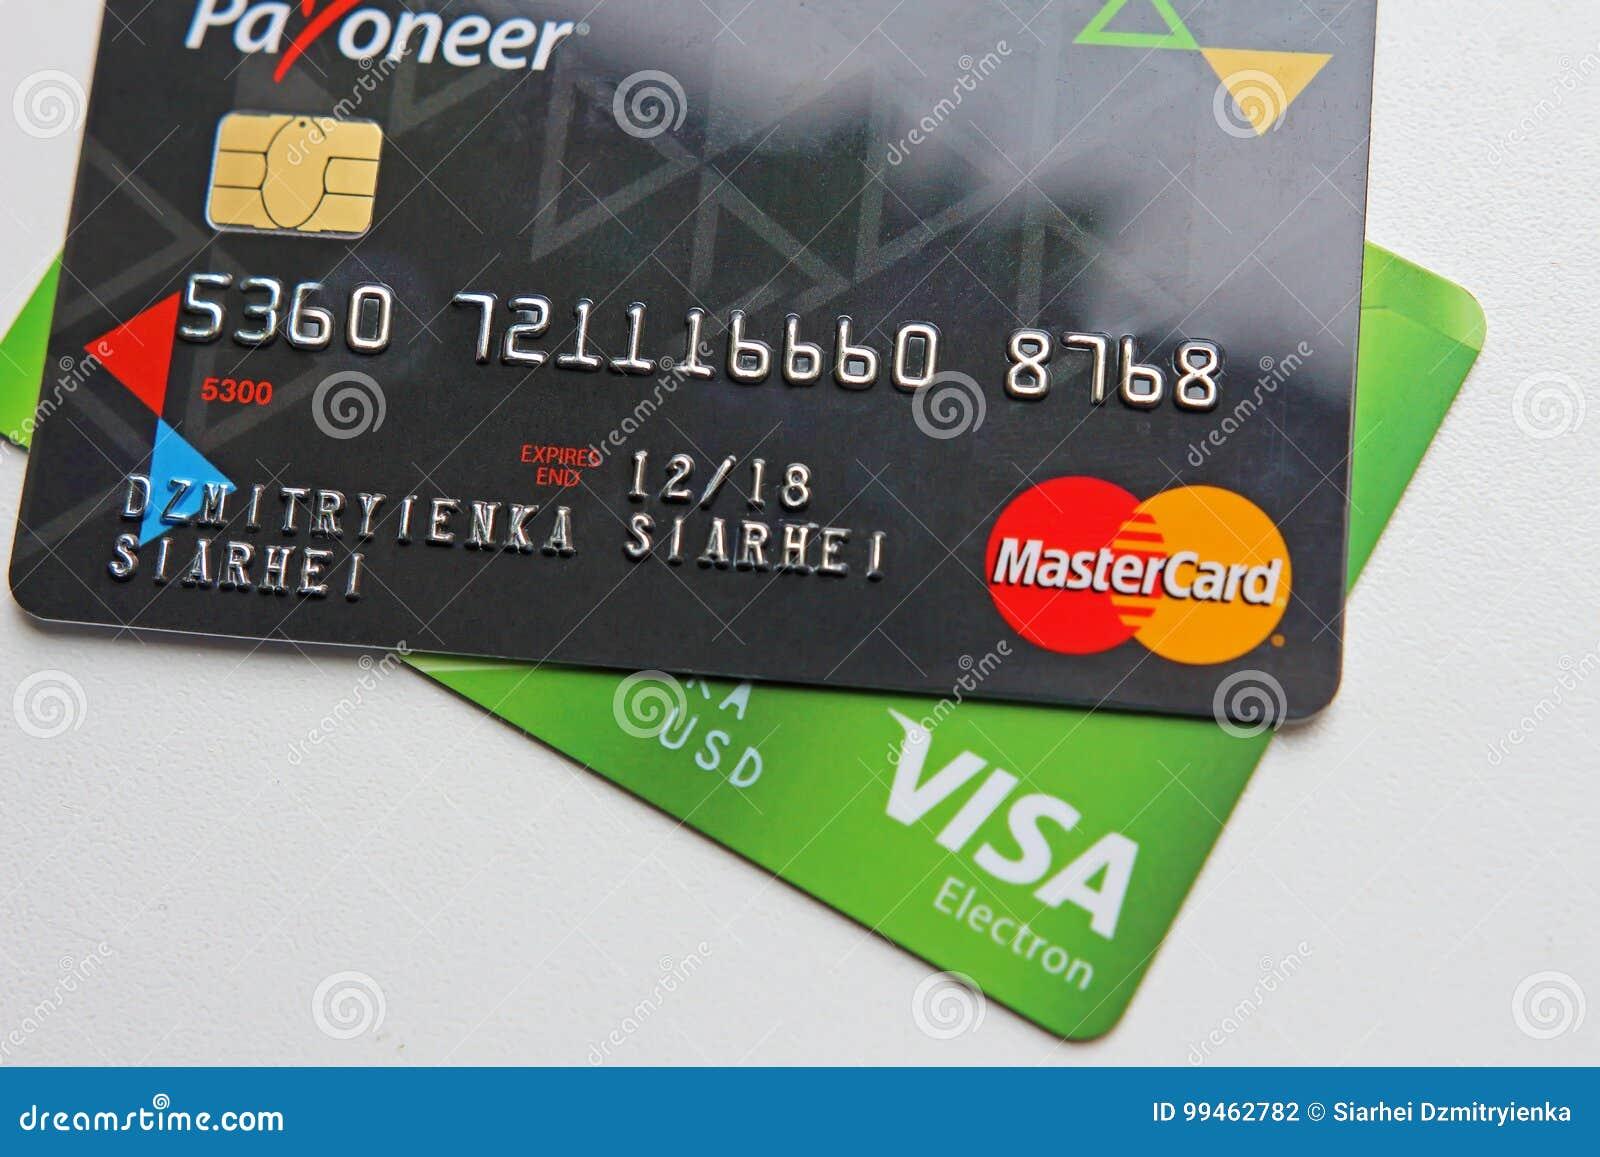 Mastercard Germany